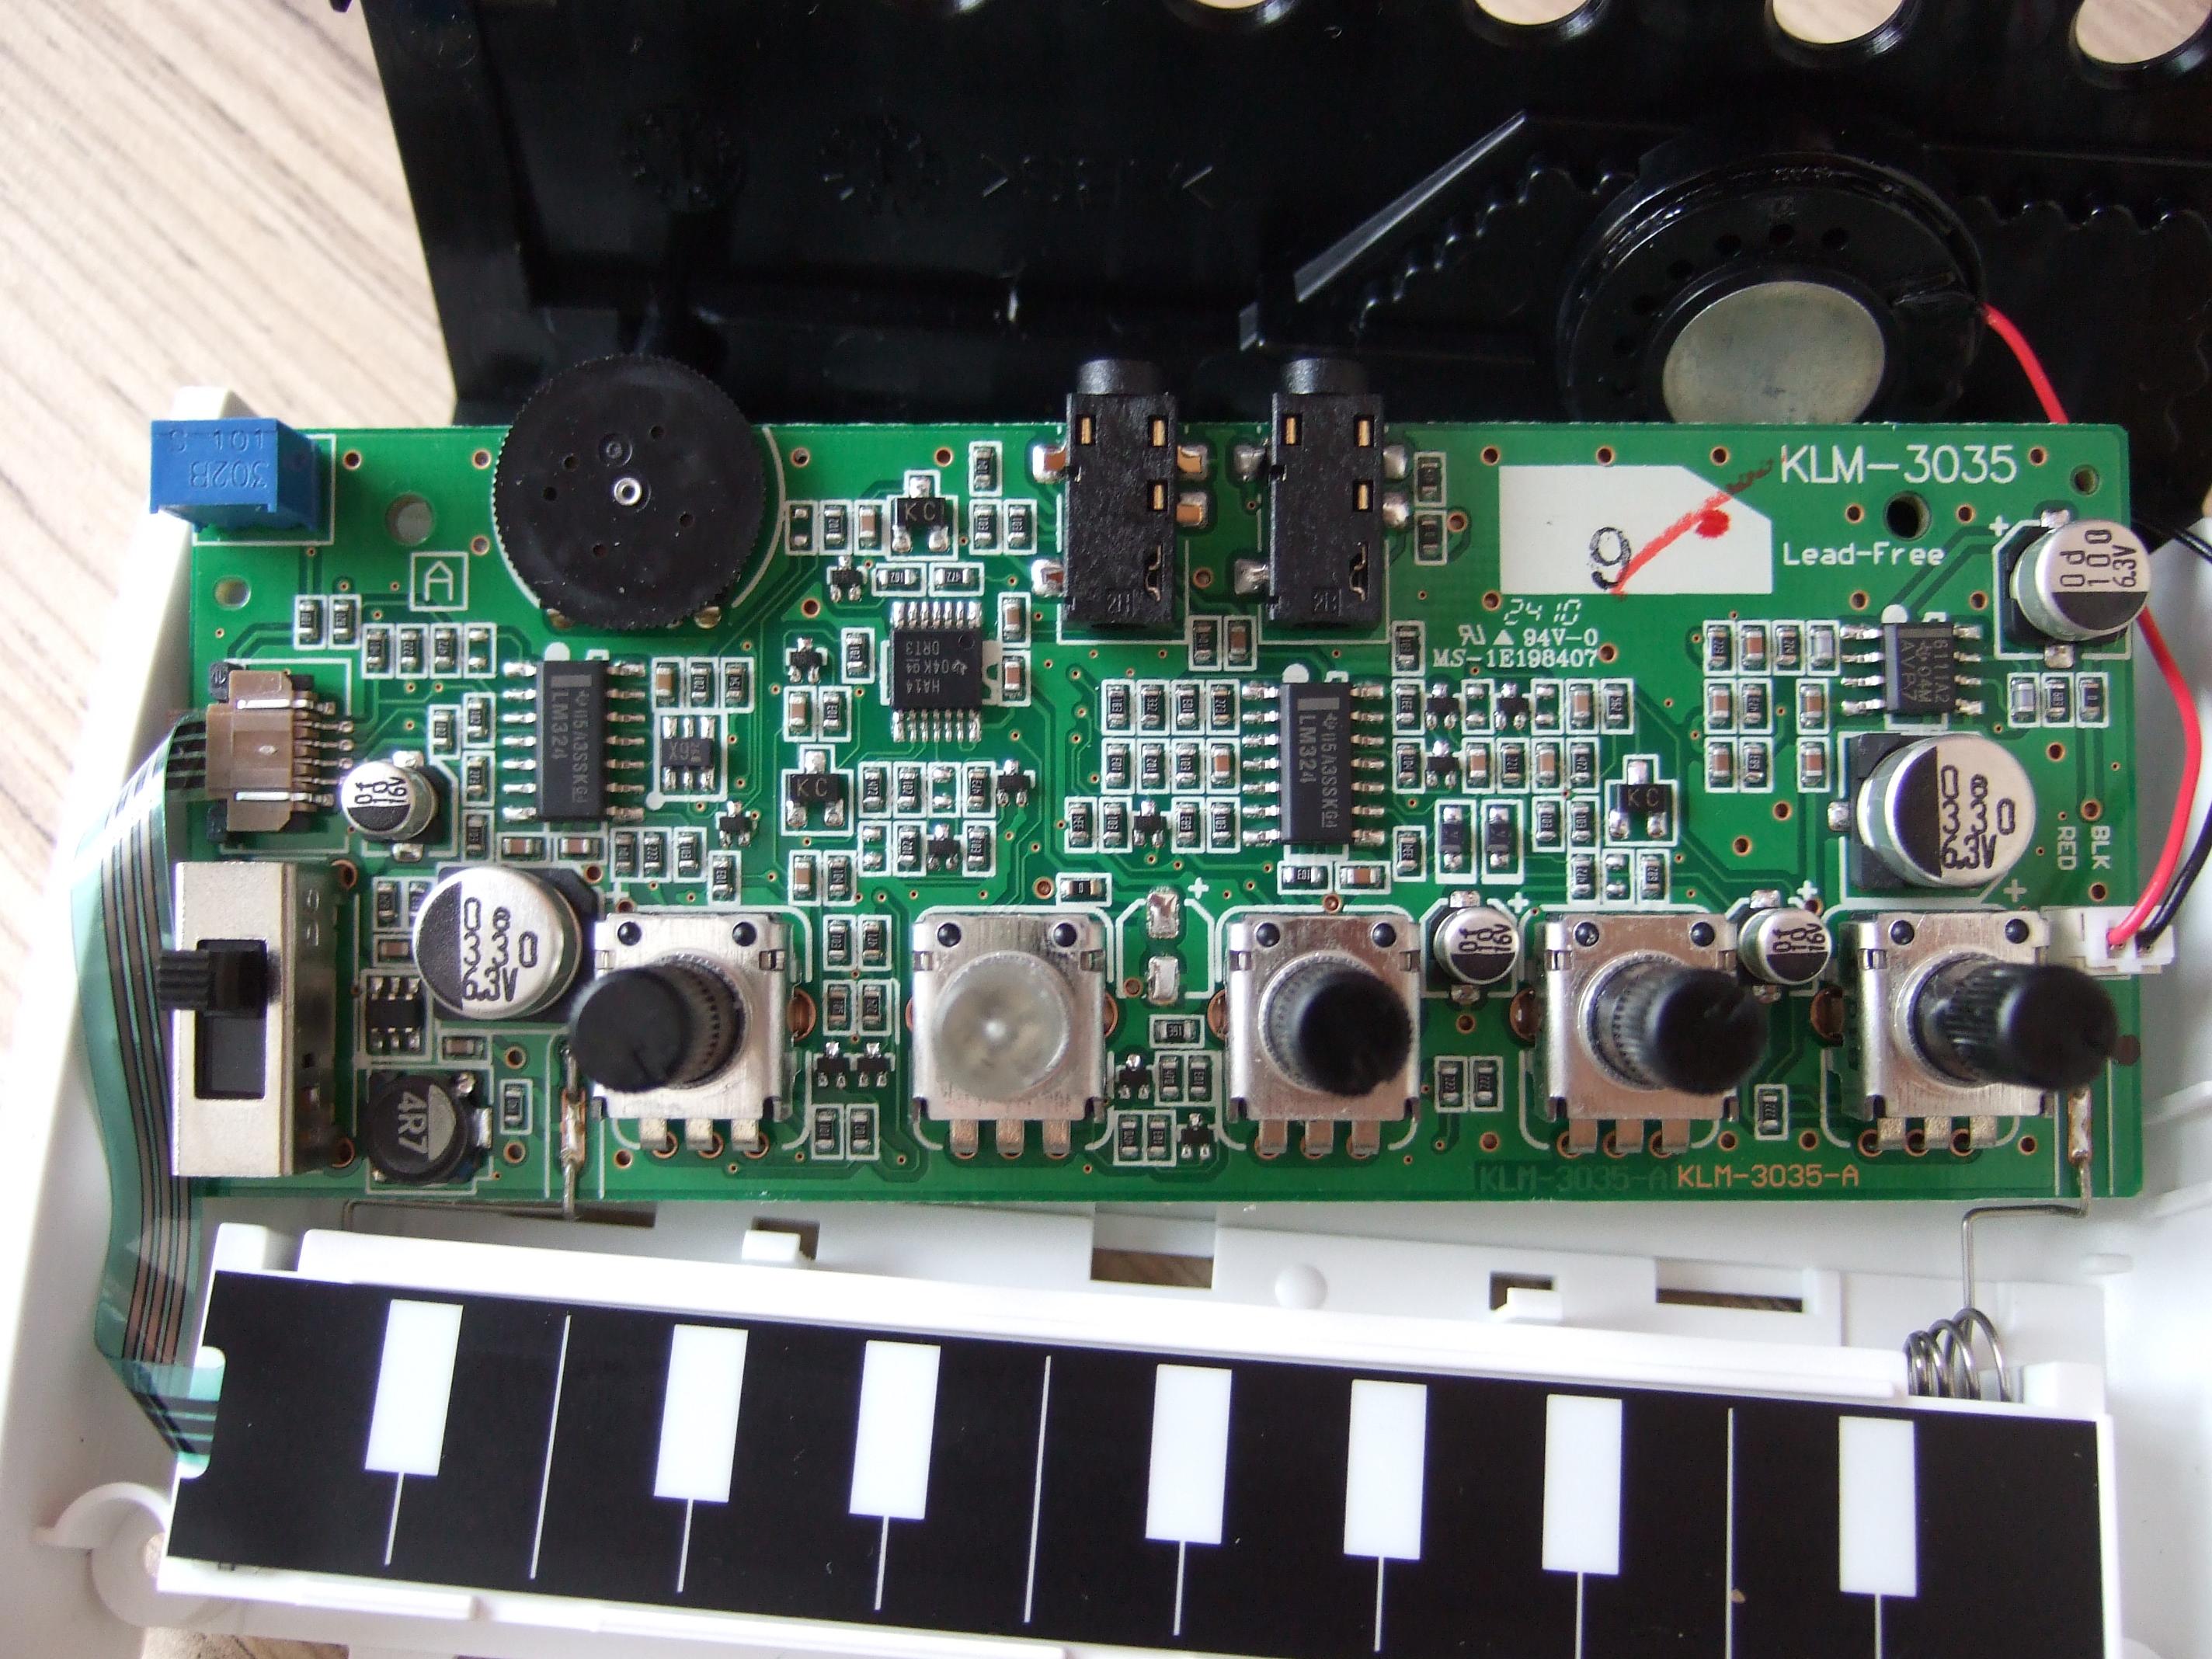 Filekorg Monotron Internals Wikimedia Commons Selfbalancing Robot With Basic Electronics Hacks Mods Circuitry